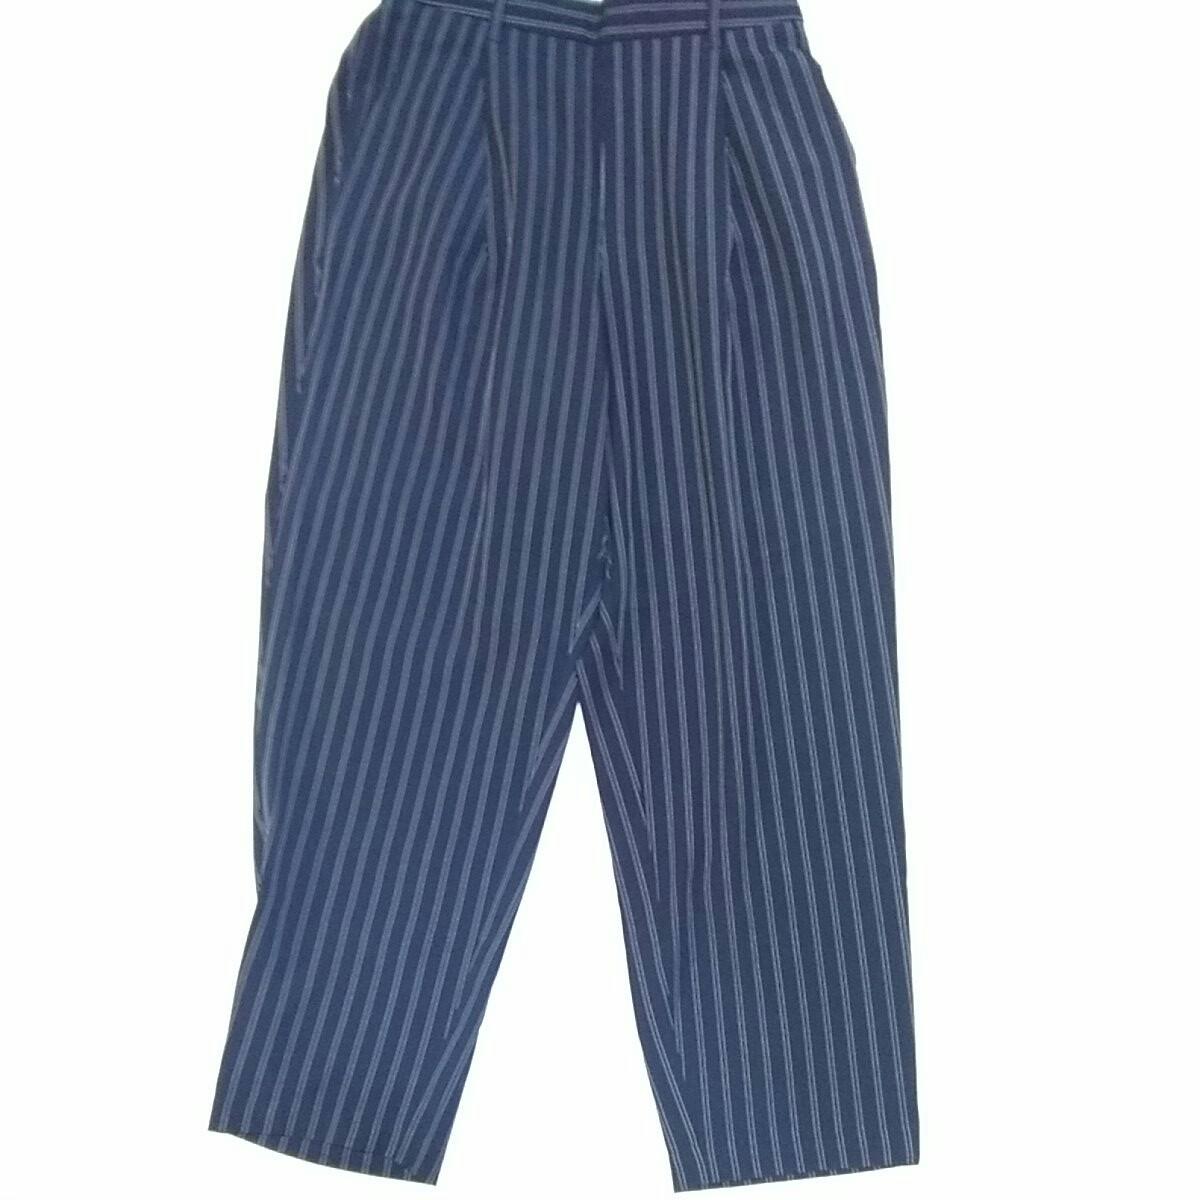 GU 紺色ストライプパンツ Lサイズ